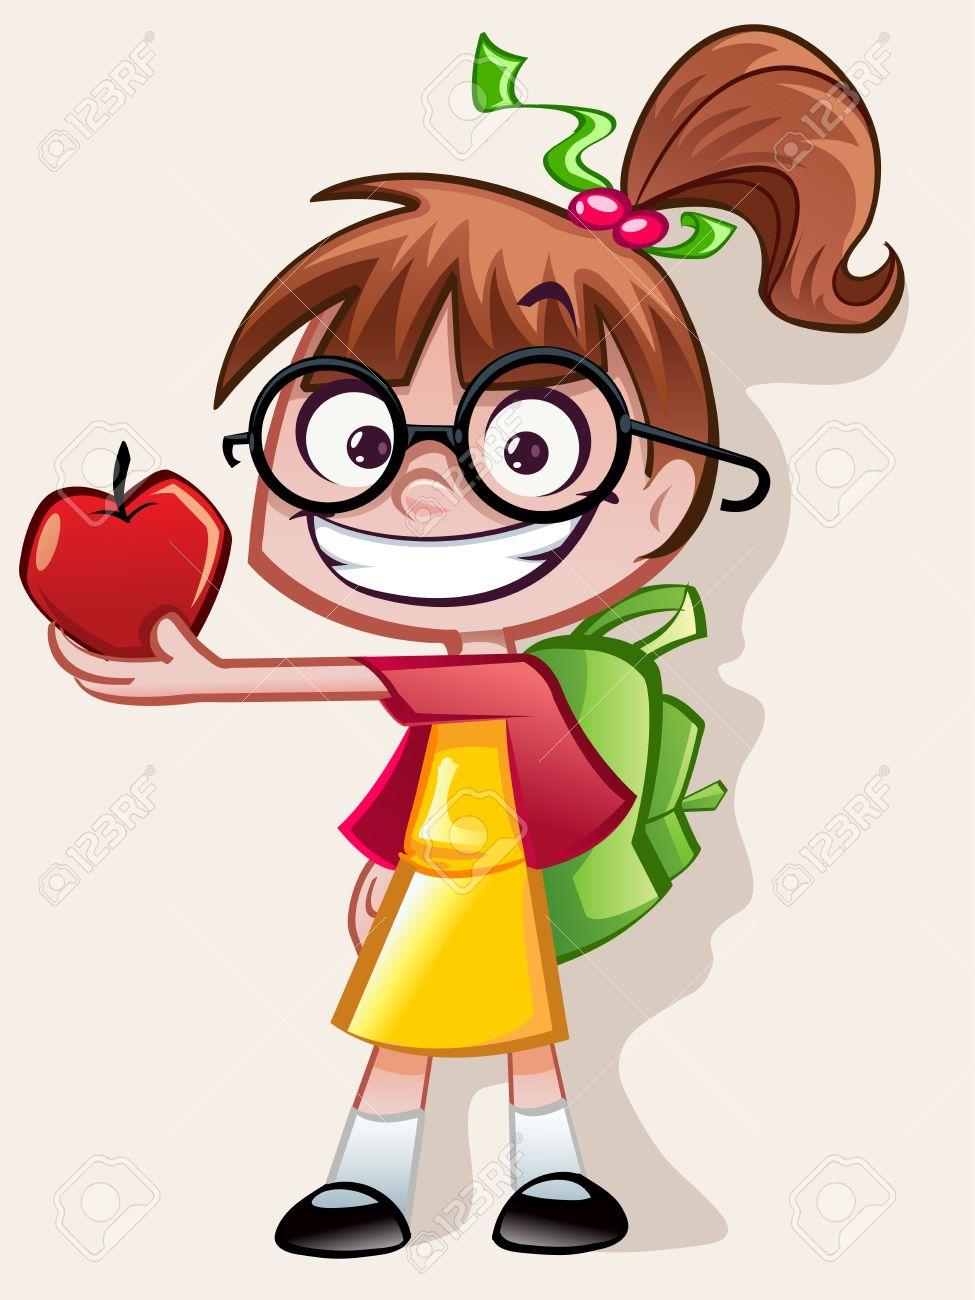 medium resolution of nerd girl teachers pet stock vector 28524442